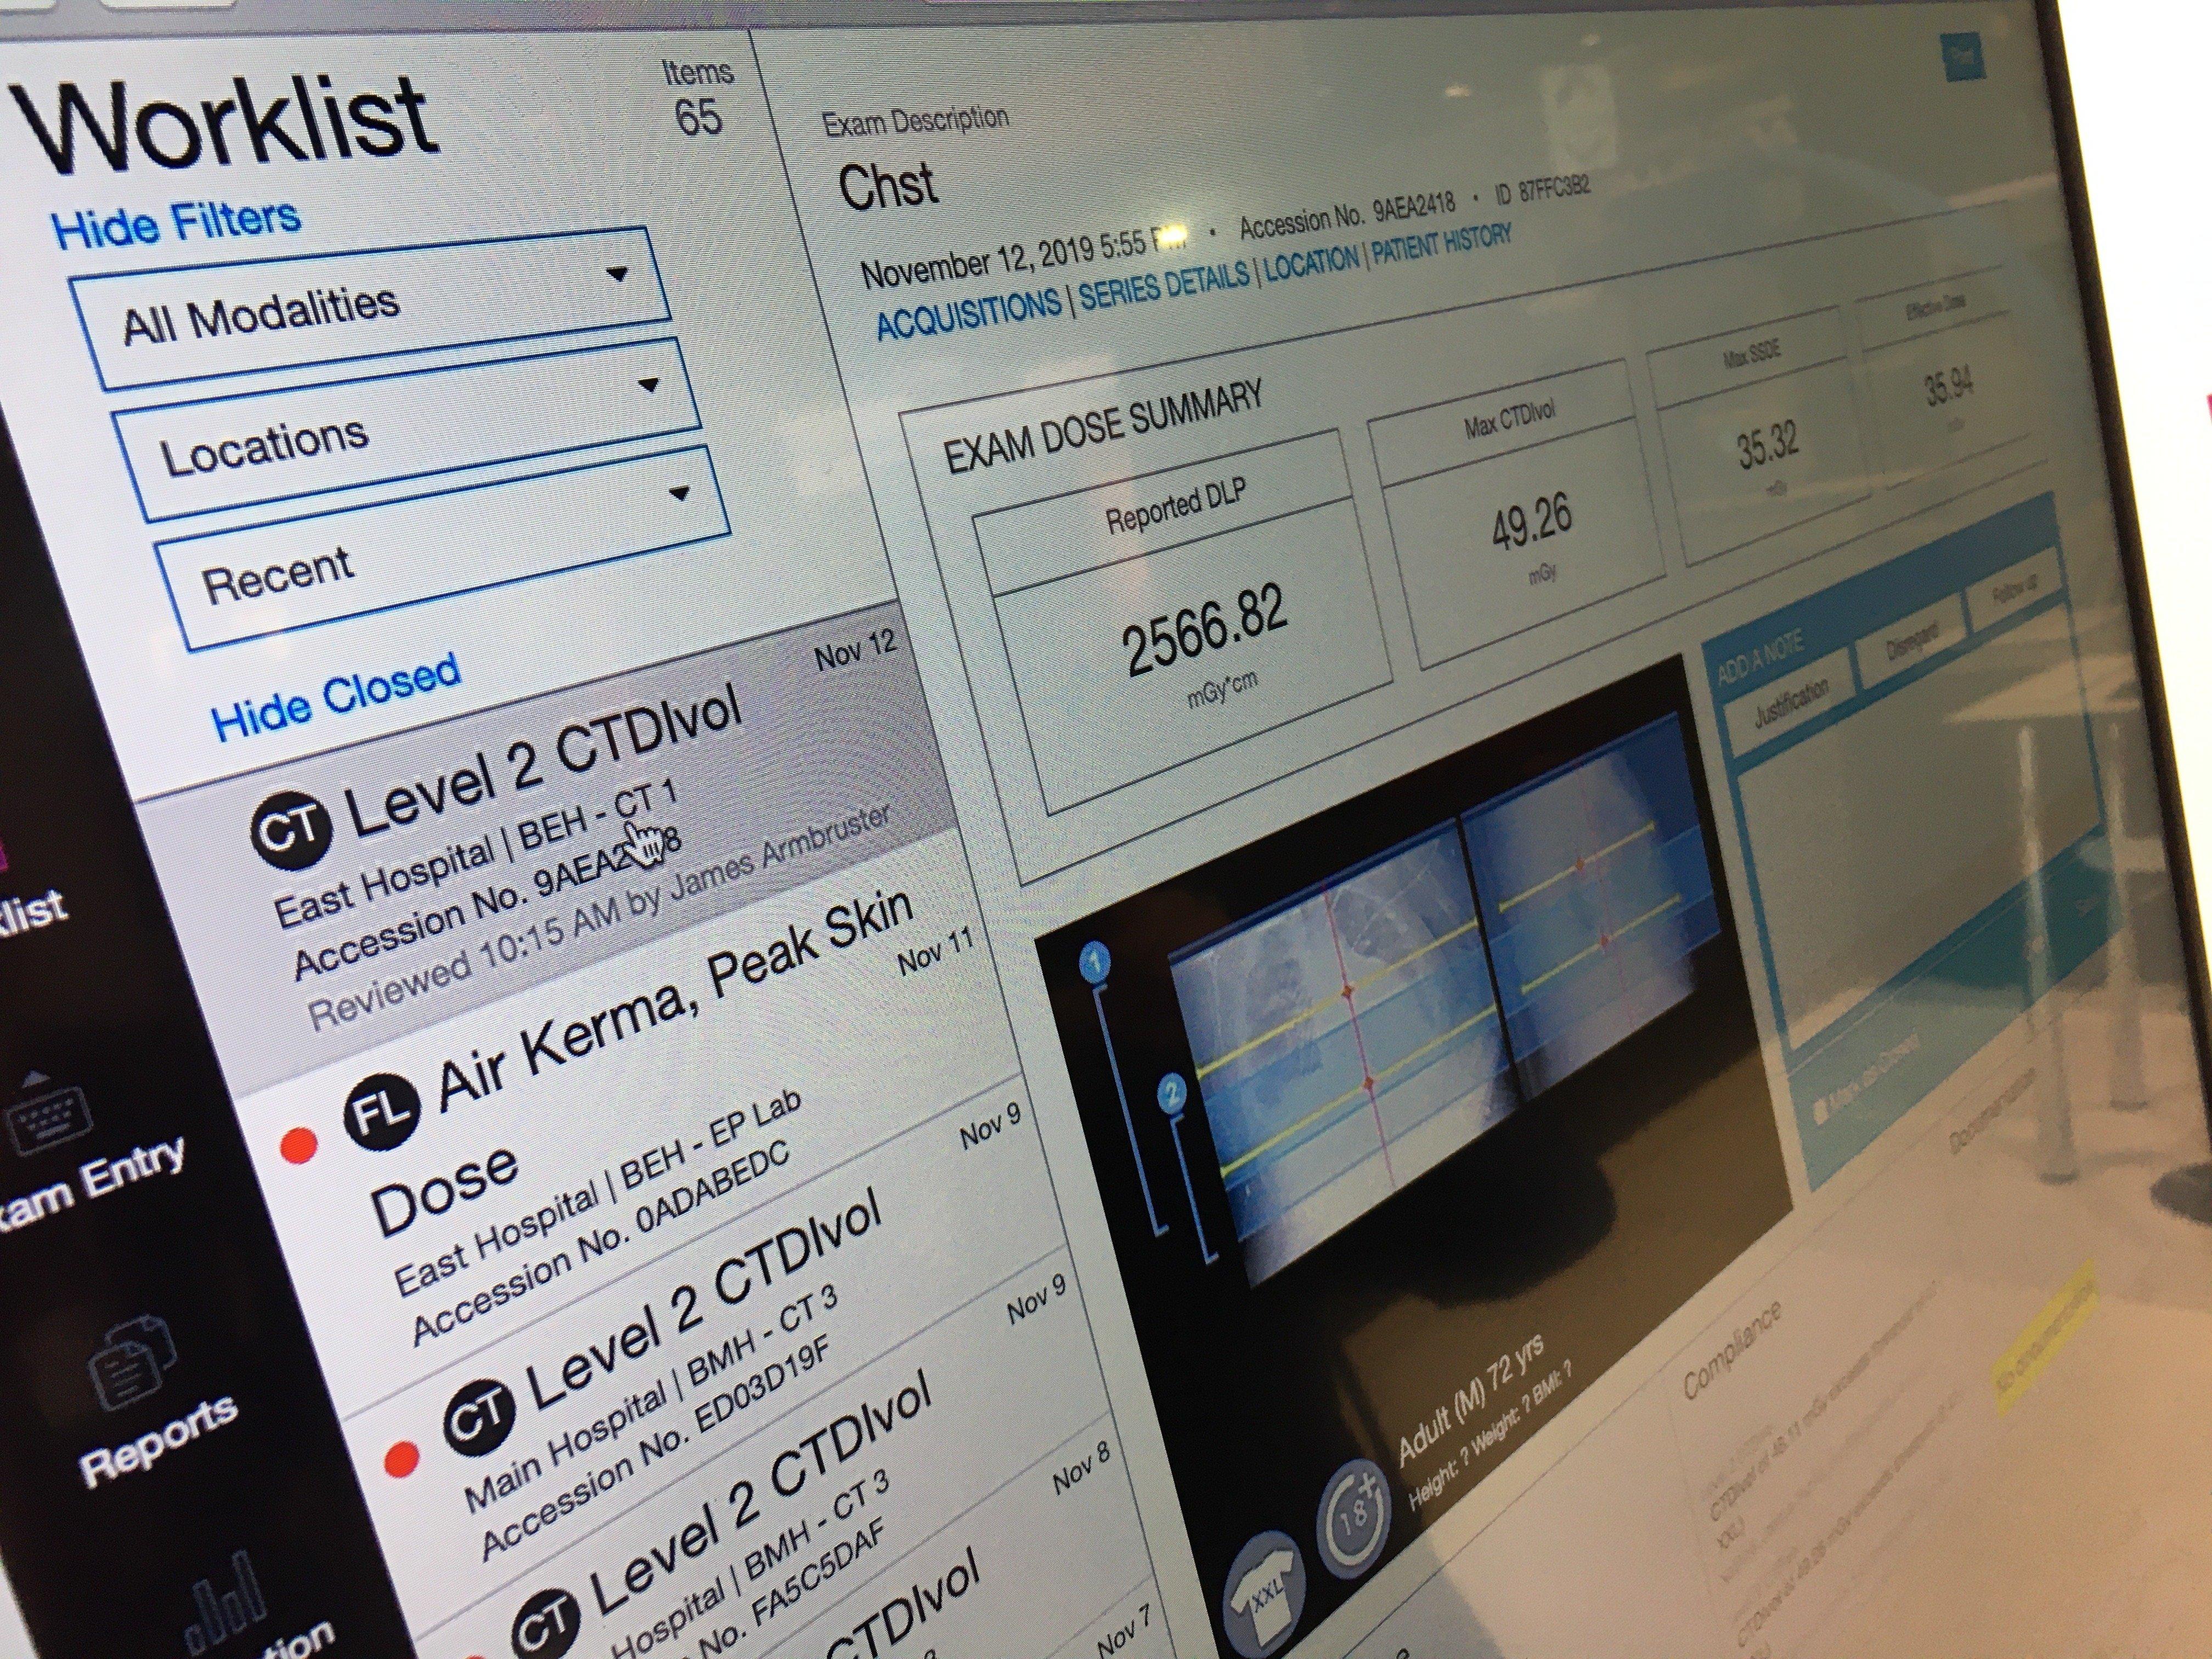 CT imaging radiation dose tracking software from Imalogix displayed at RSNA 2019.